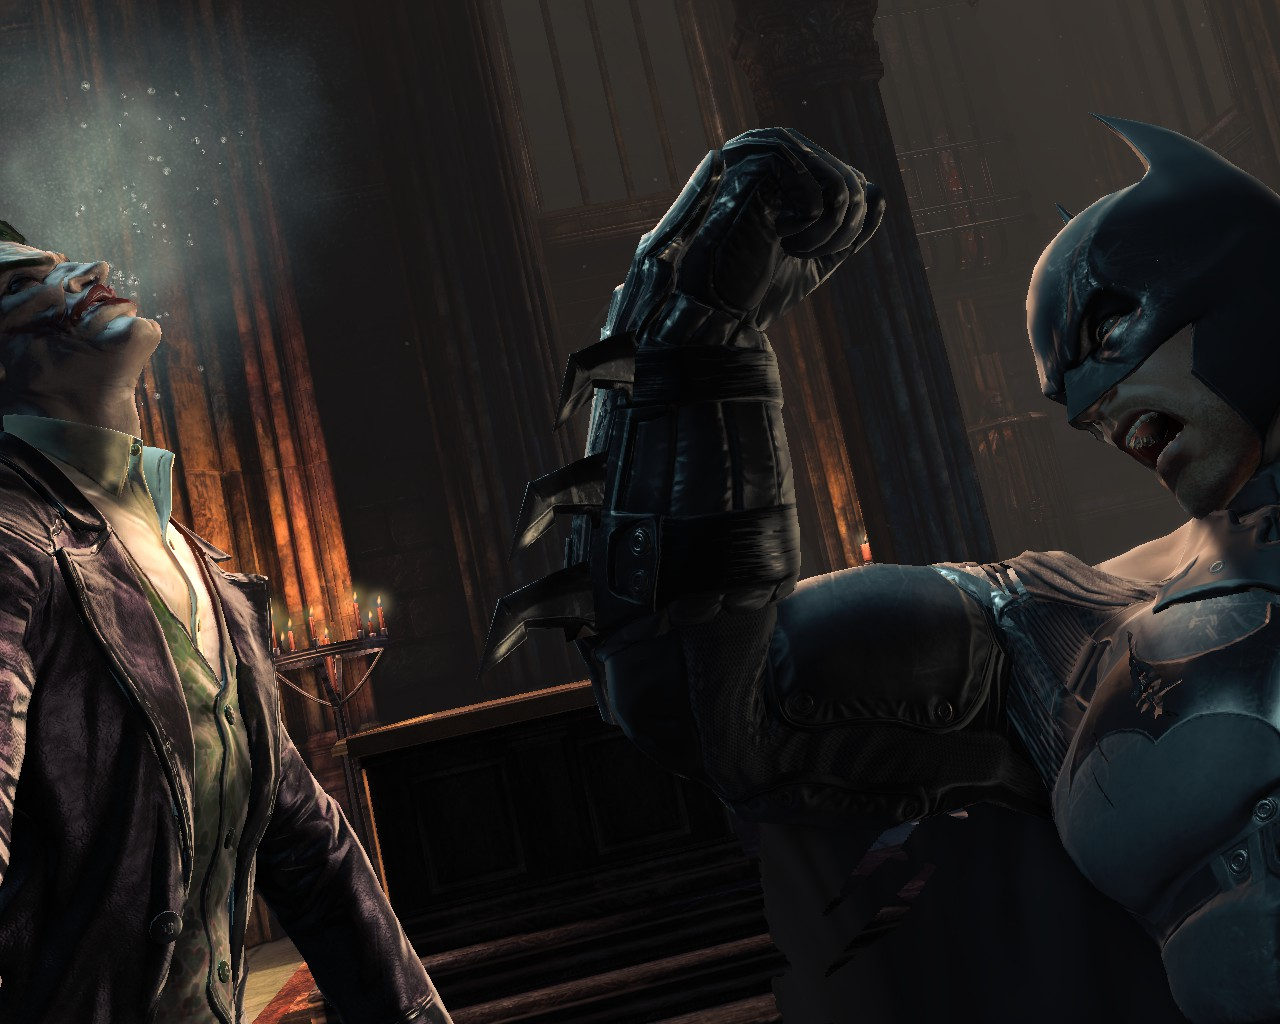 BatmanOrigins 2014-07-06 02-36-45-79.jpg - Batman: Arkham Origins